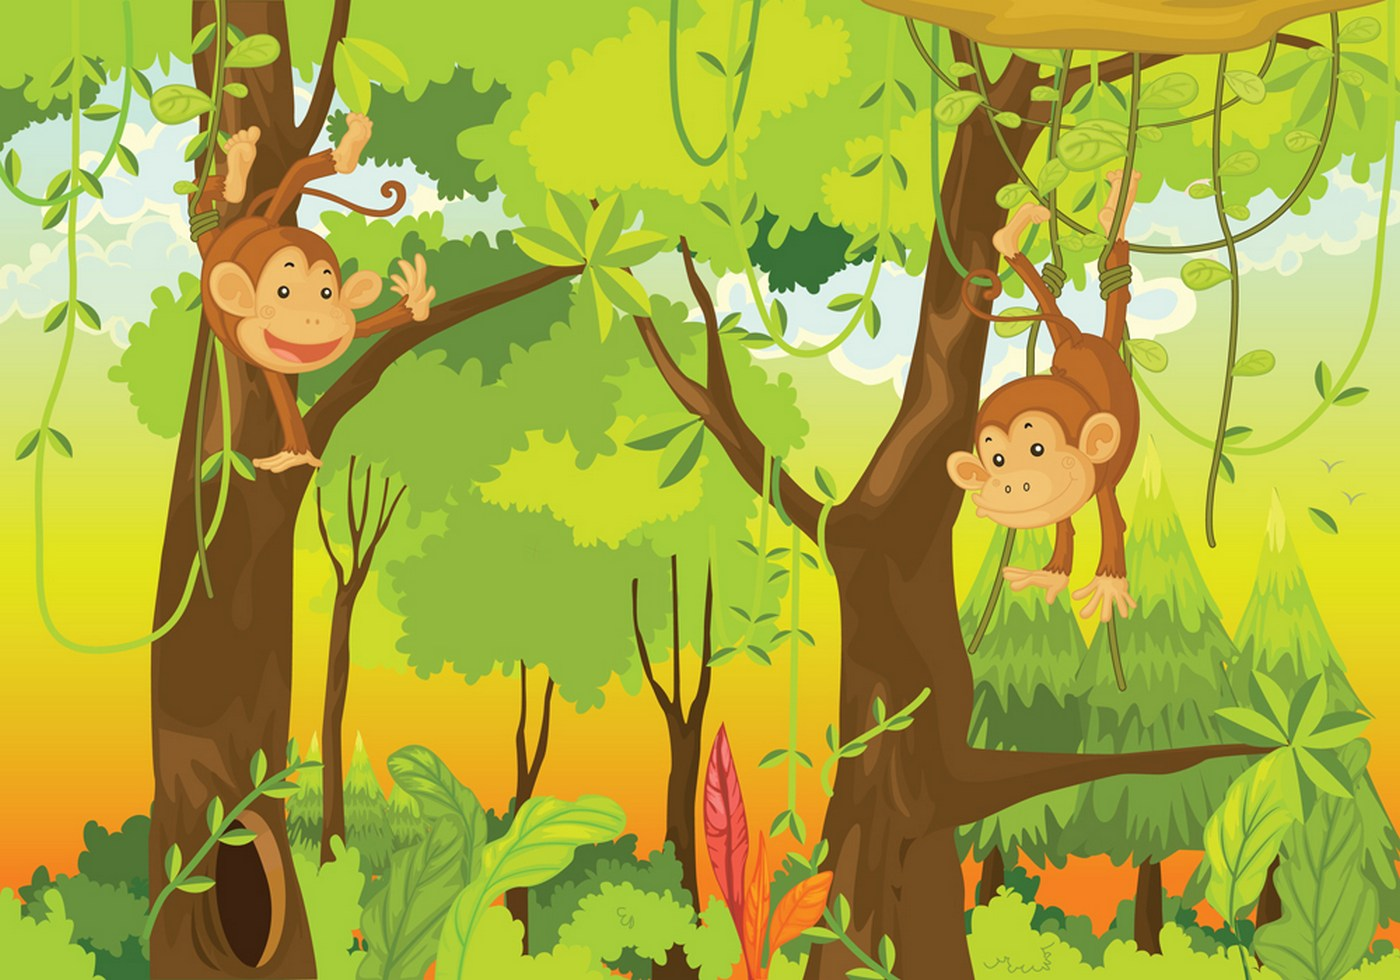 Vlies Fototapete  Jungle Animals Monkeys Kindertapete Tapete Kinderzimmer Safari Comic Affen Dschungel